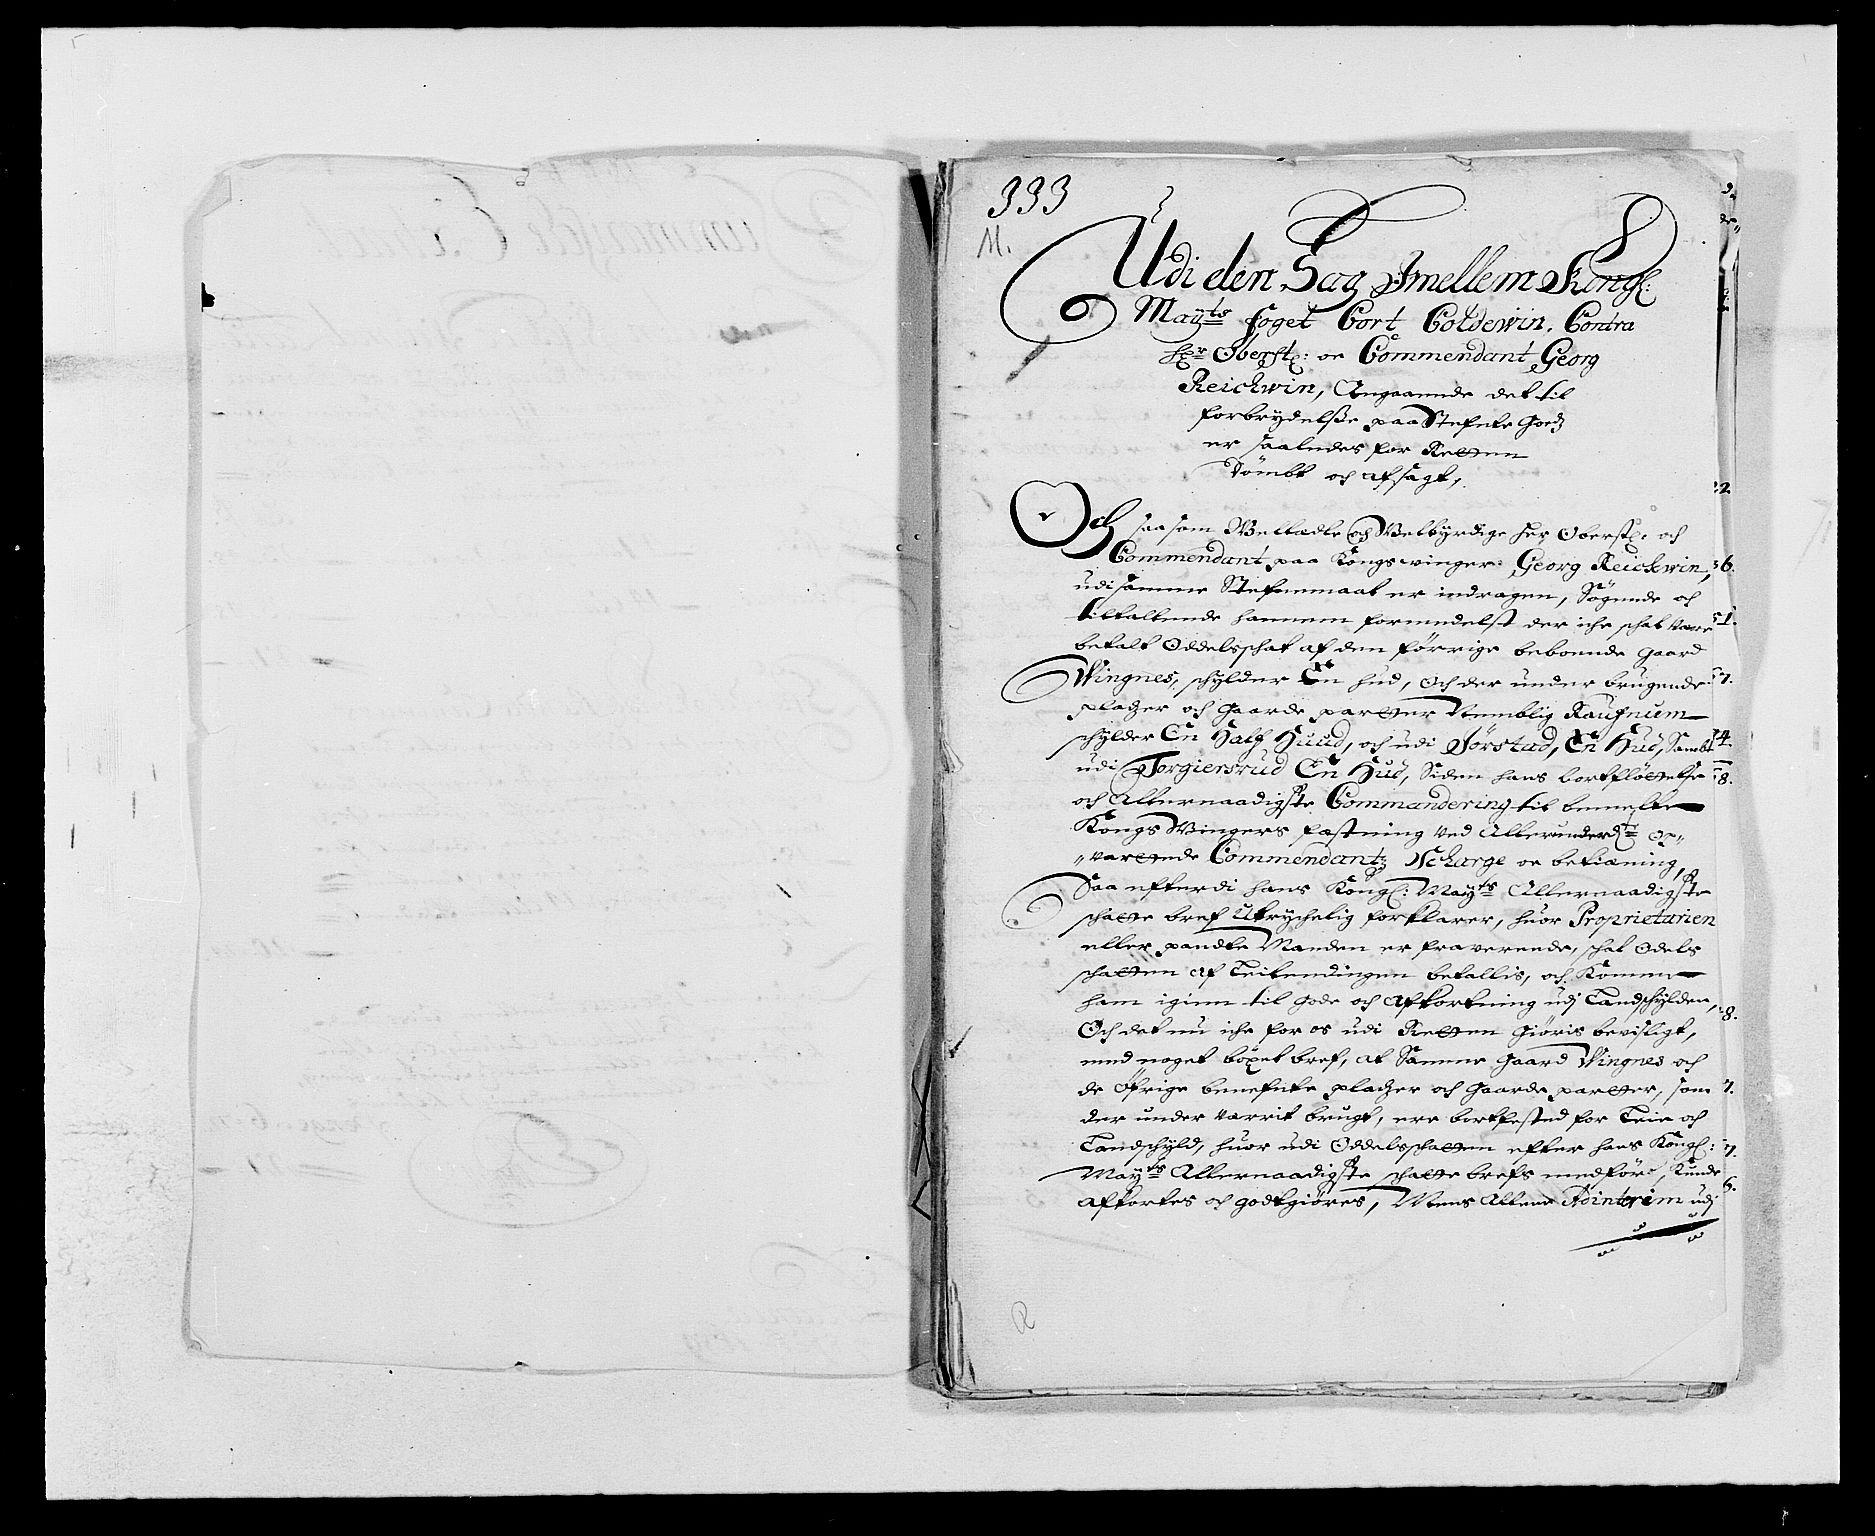 RA, Rentekammeret inntil 1814, Reviderte regnskaper, Fogderegnskap, R17/L1164: Fogderegnskap Gudbrandsdal, 1682-1689, s. 31